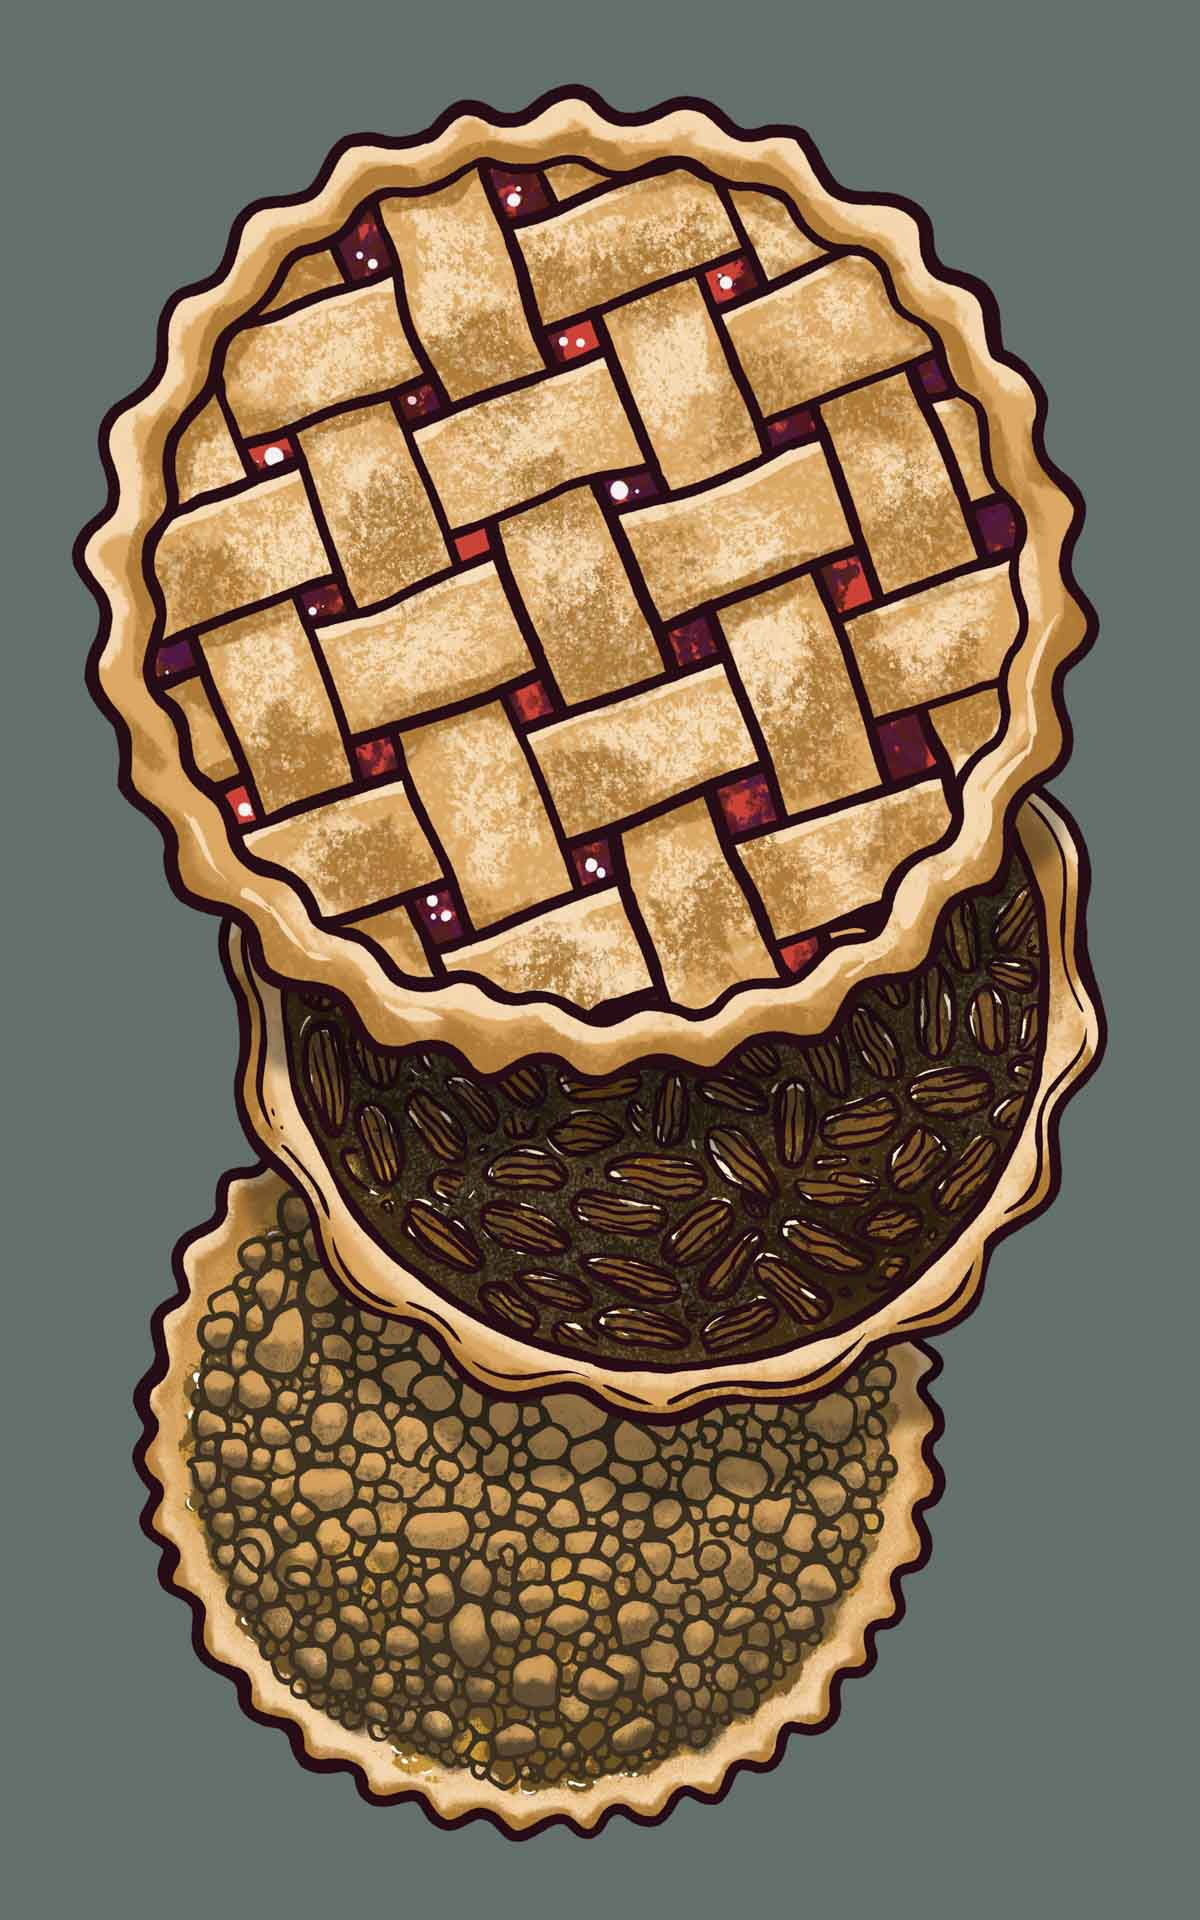 Mama Linda's Bakeshop in Phoenix, Arizona makes pies. All kinds of pies.